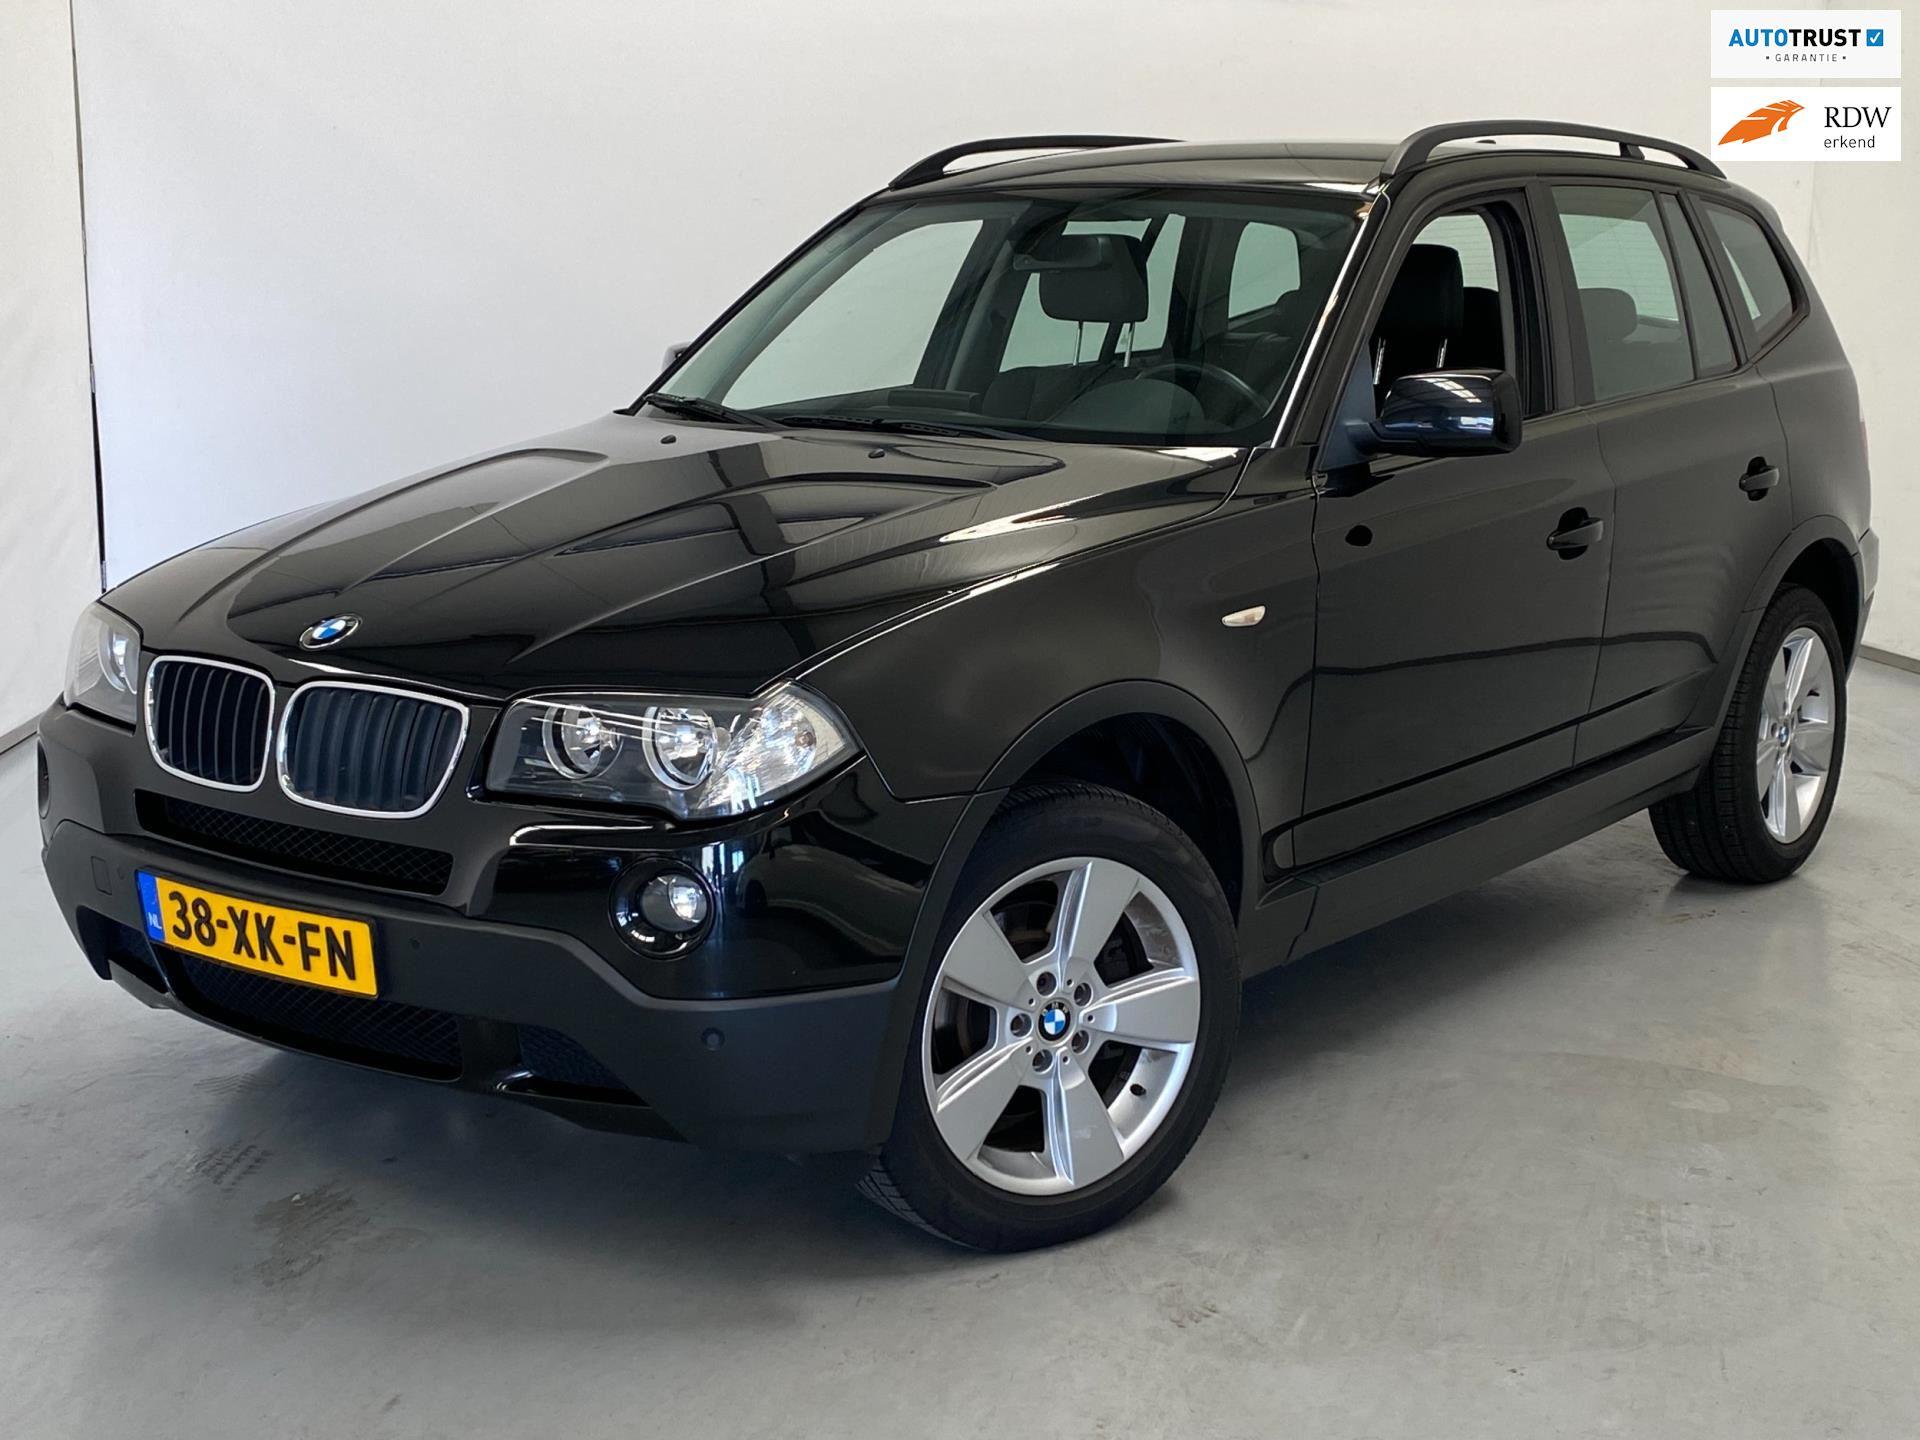 BMW X3 occasion - Van den Brink Auto's